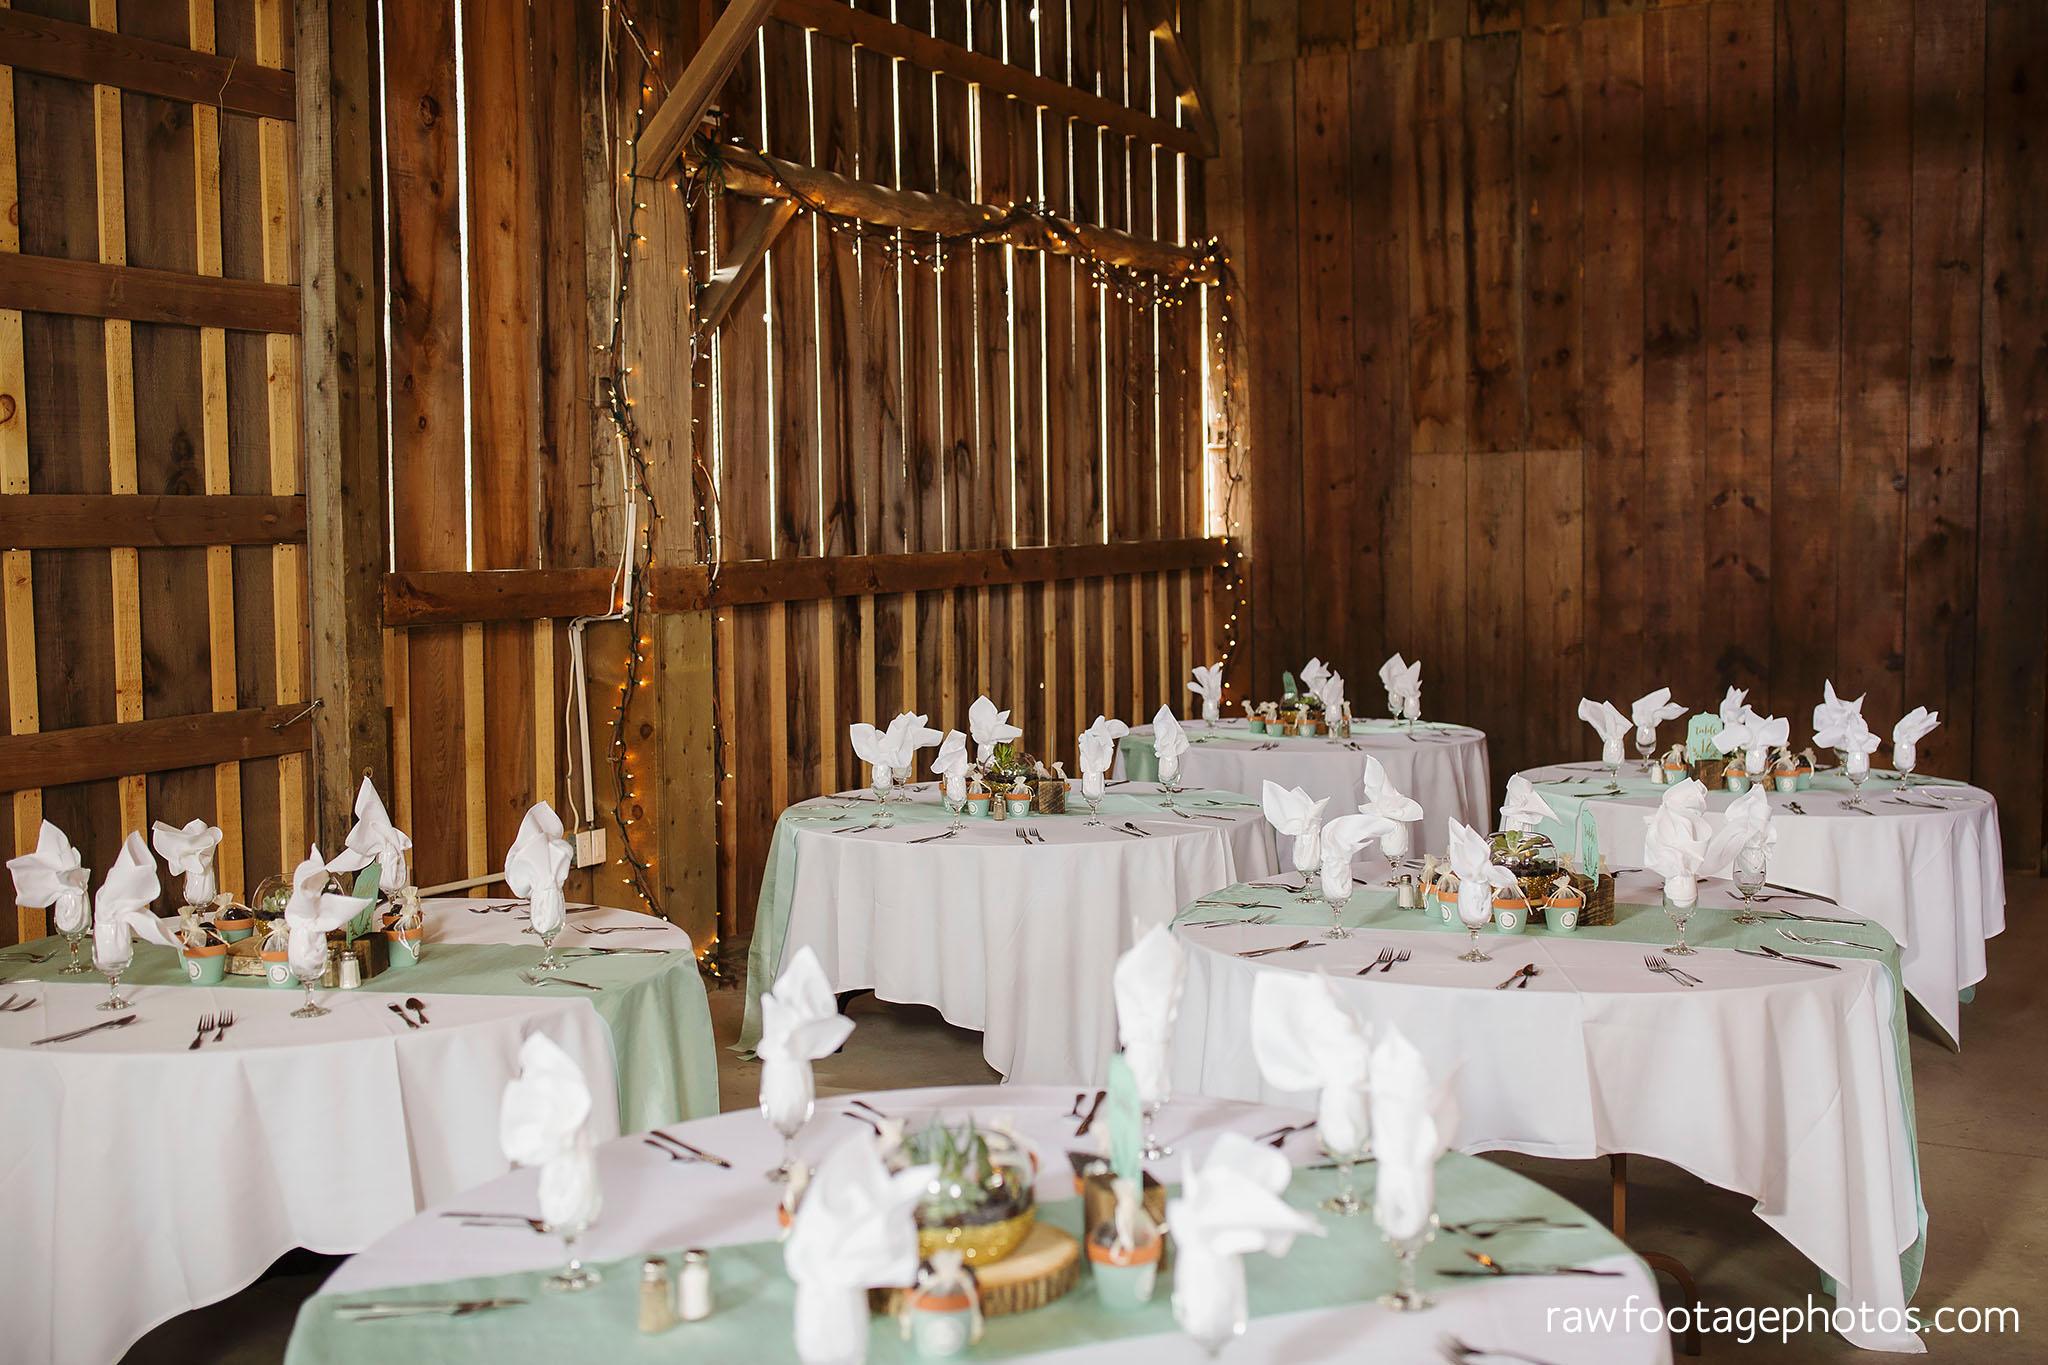 london_ontario_wedding_photographer-century_wedding_barn-raw_footage_photography-diy_wedding060.jpg